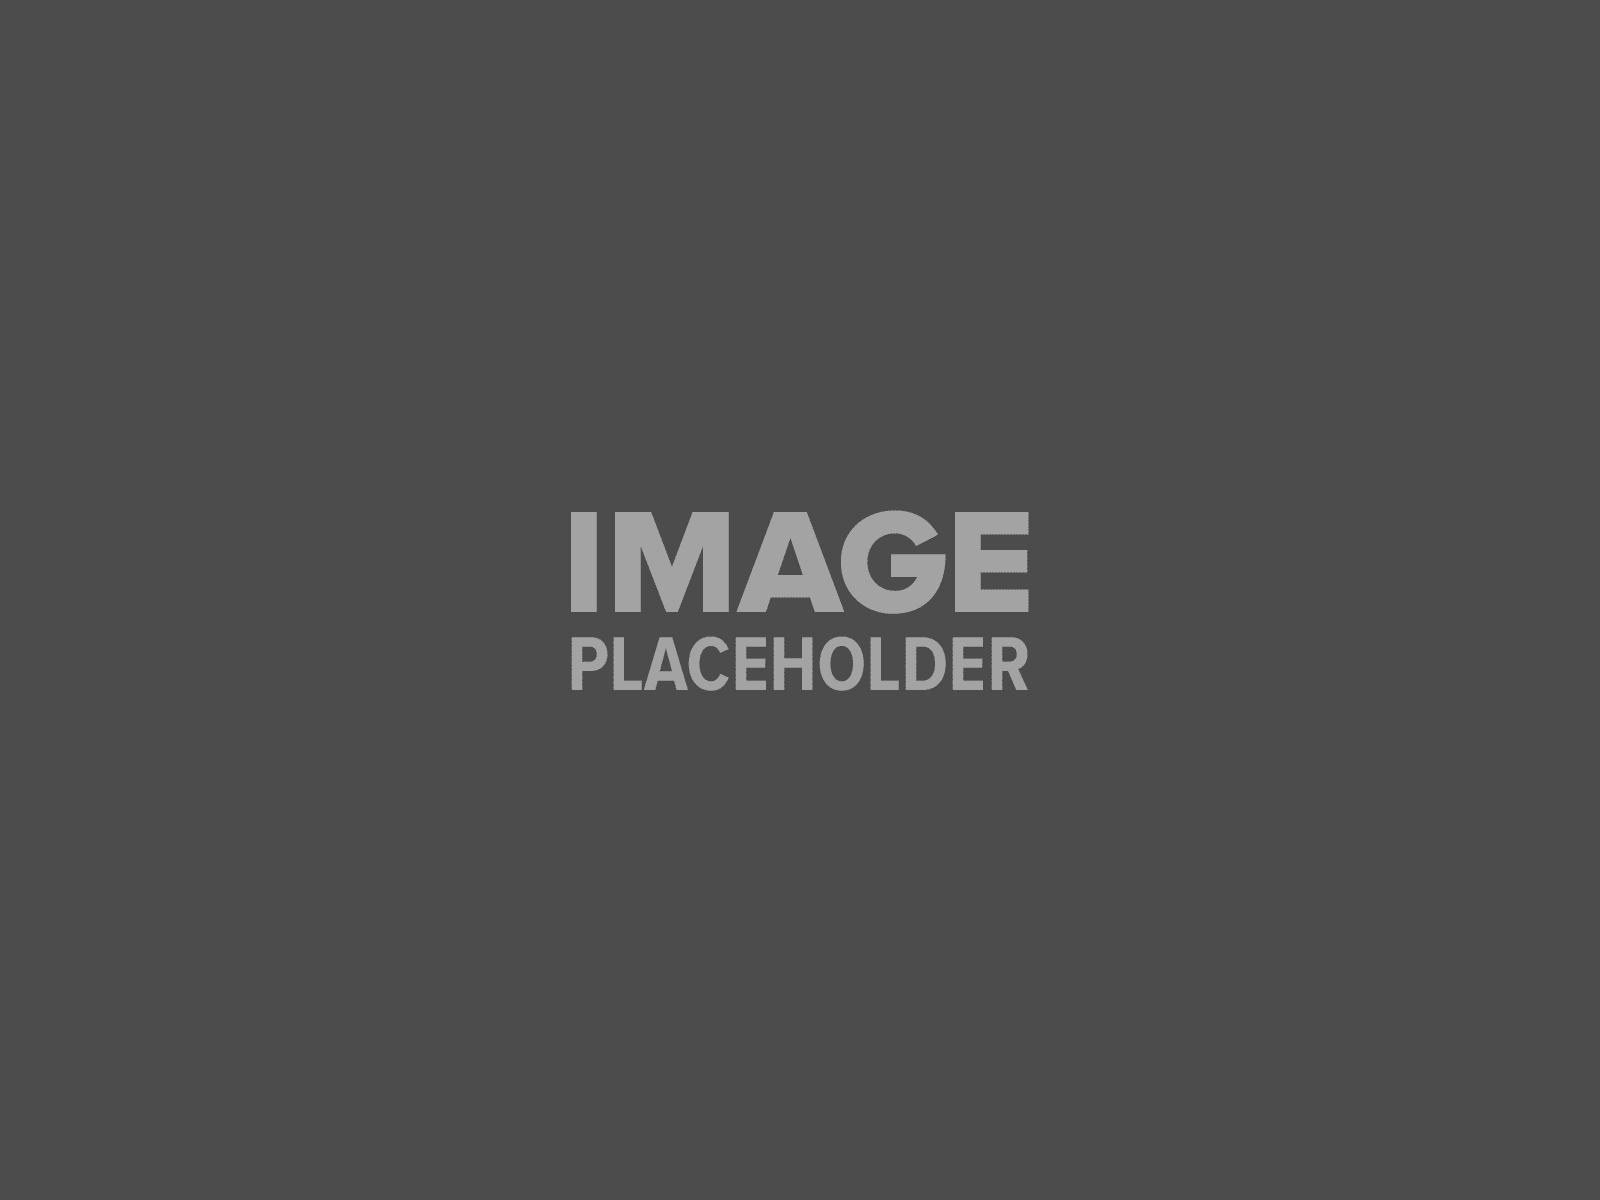 pojo-placeholder-1